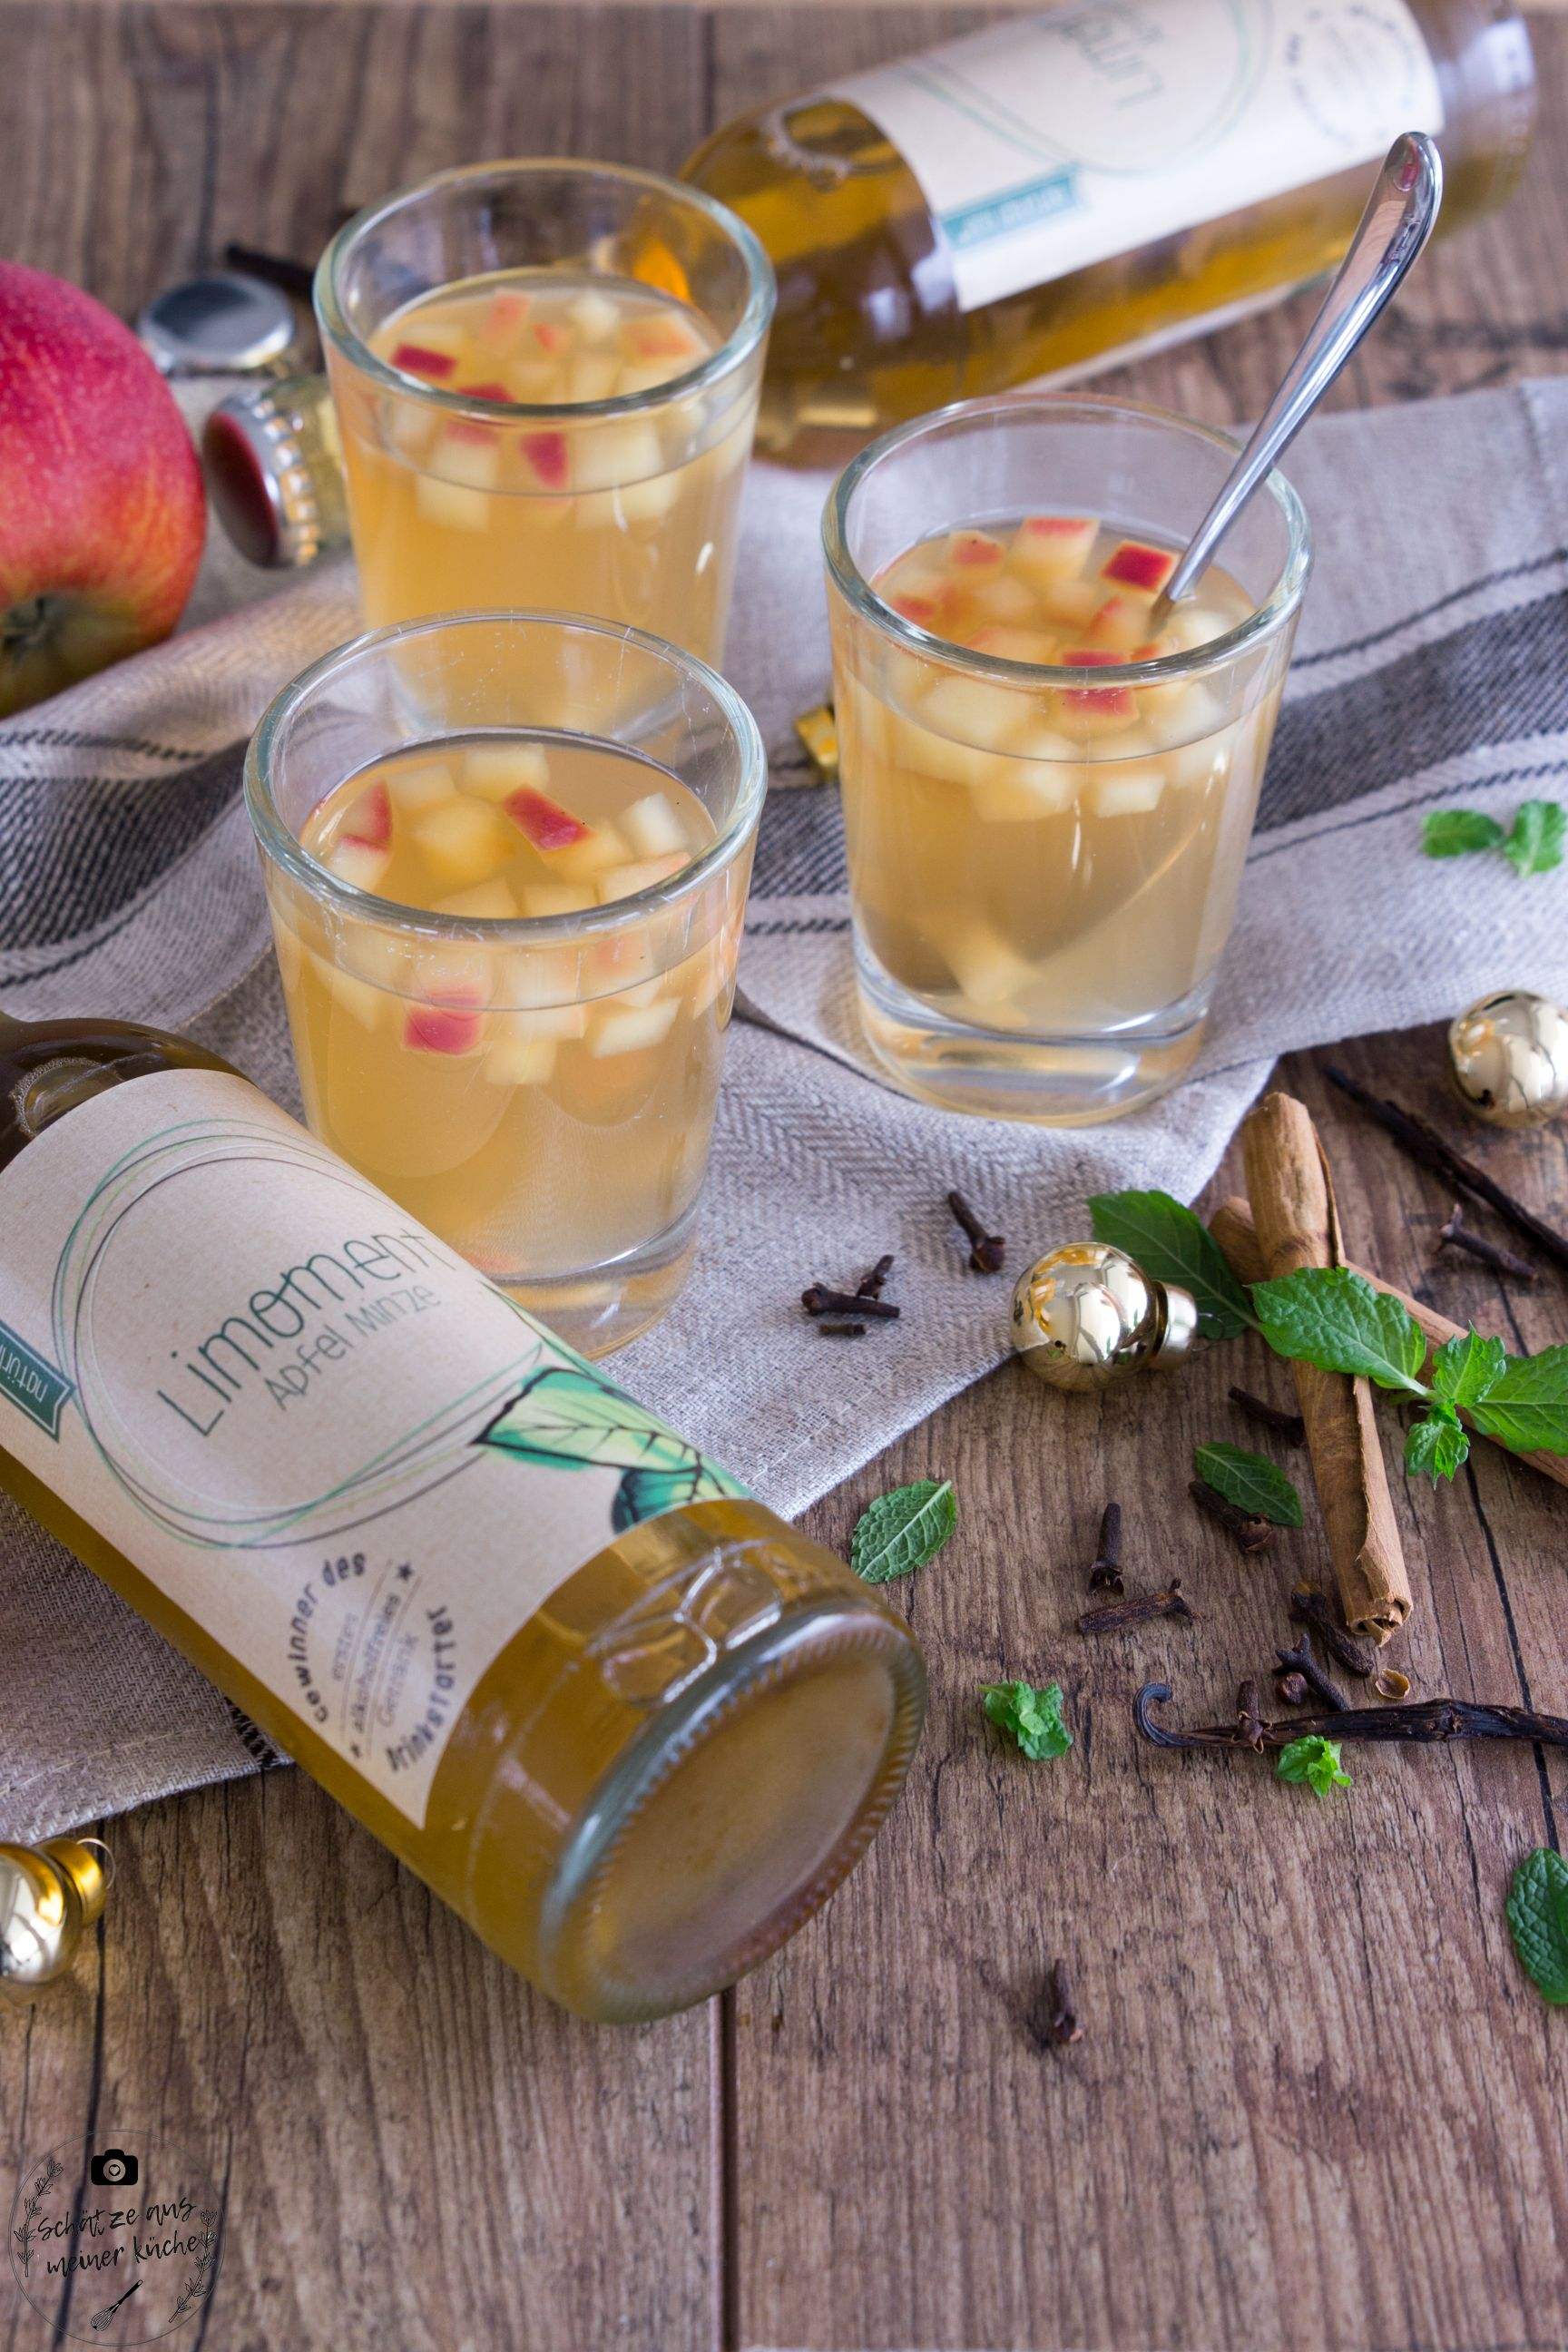 Apfel-Minze-Limonade Limoment Apfelpunsch